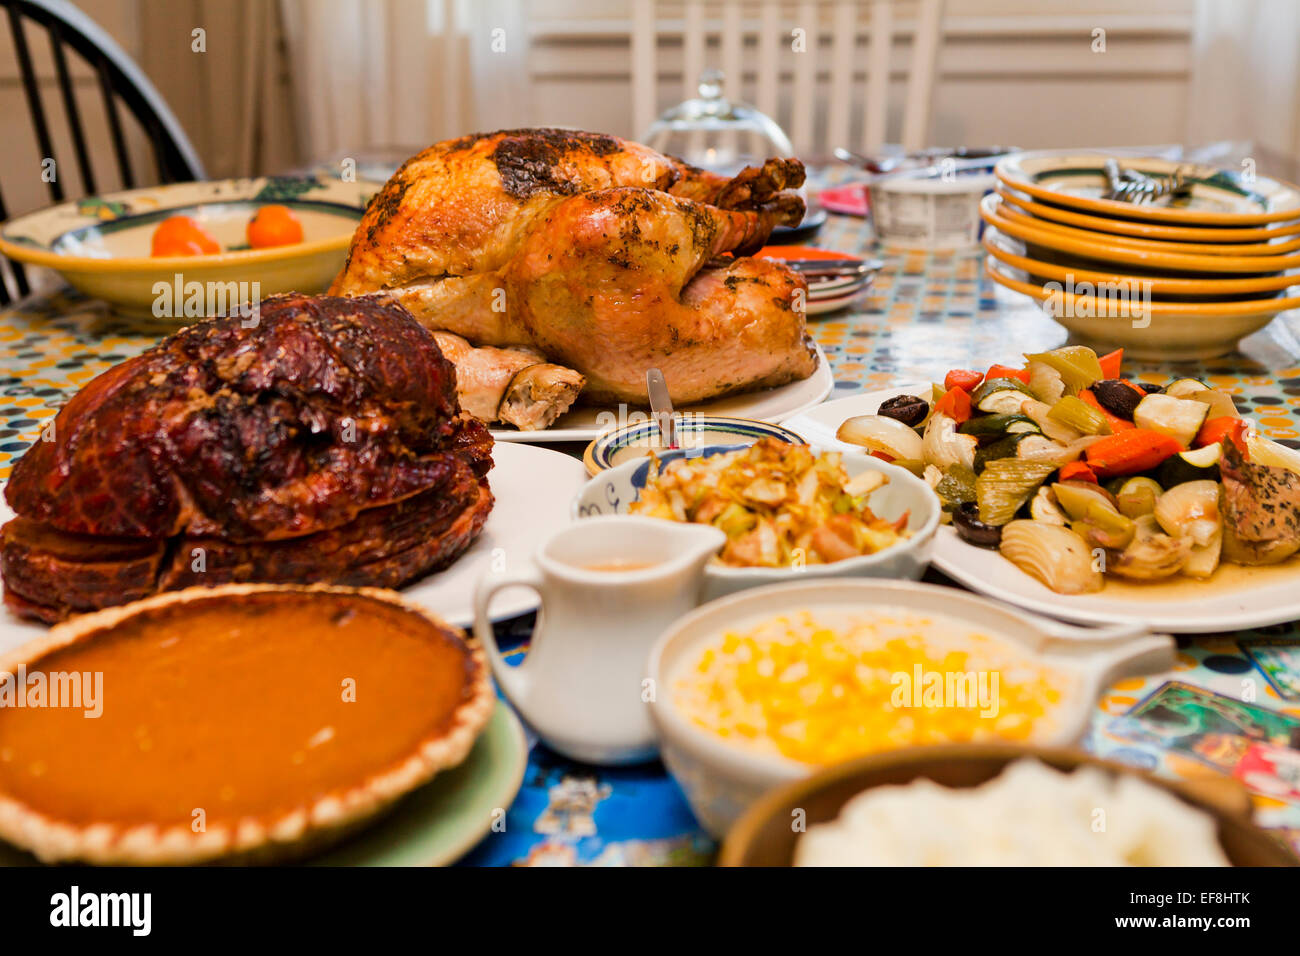 Thanksgiving online deals in usa